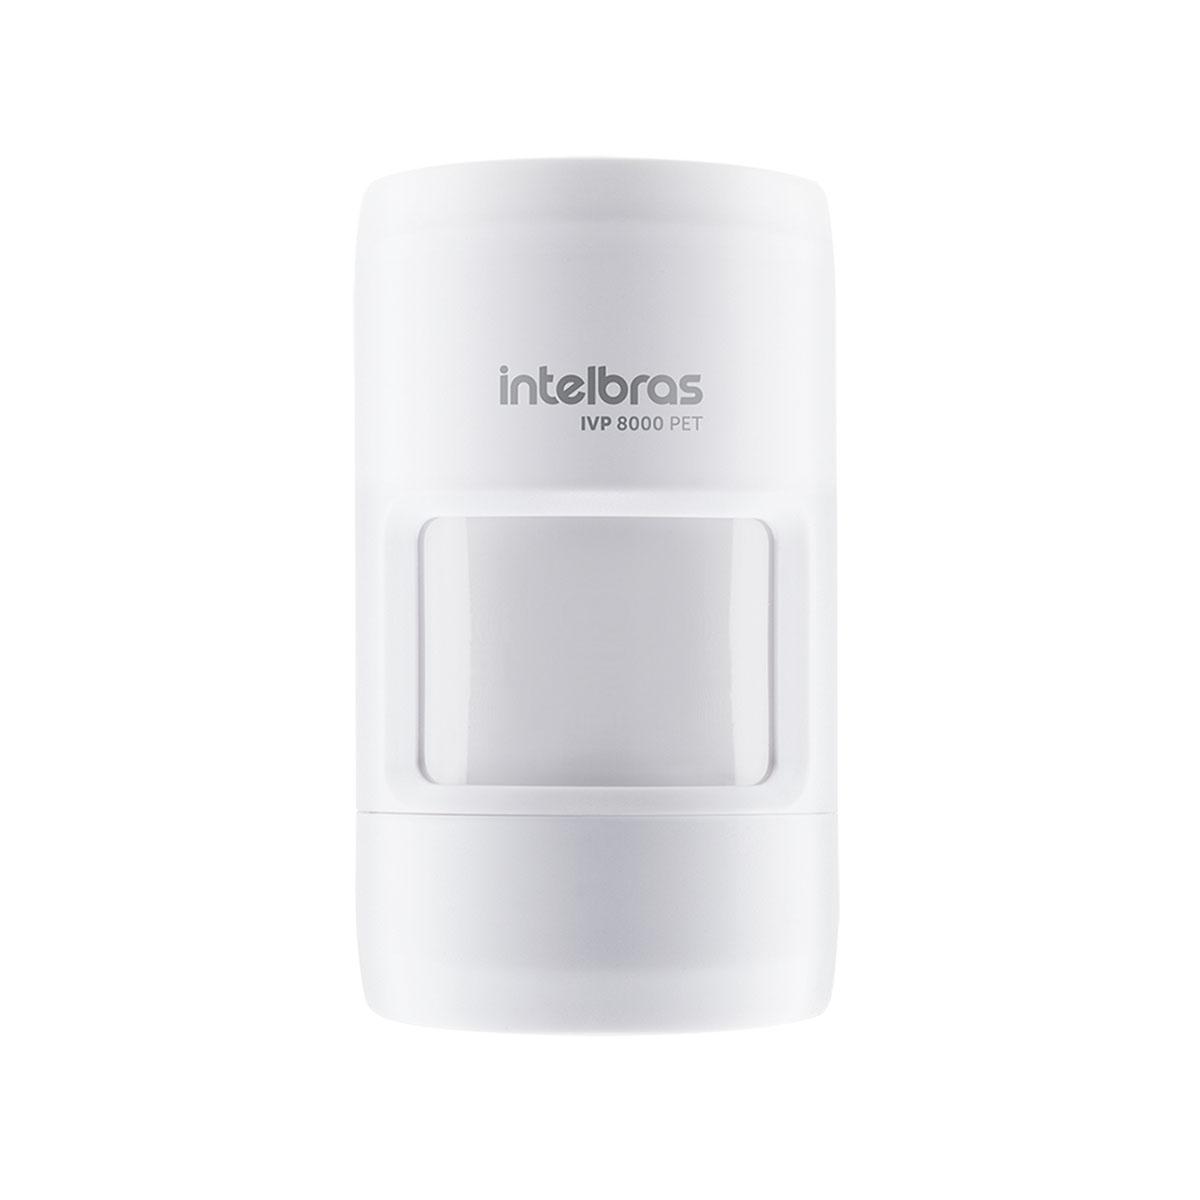 Kit 09 Sensor Passivo Sem Fio Intelbras Ivp 8000 Pet